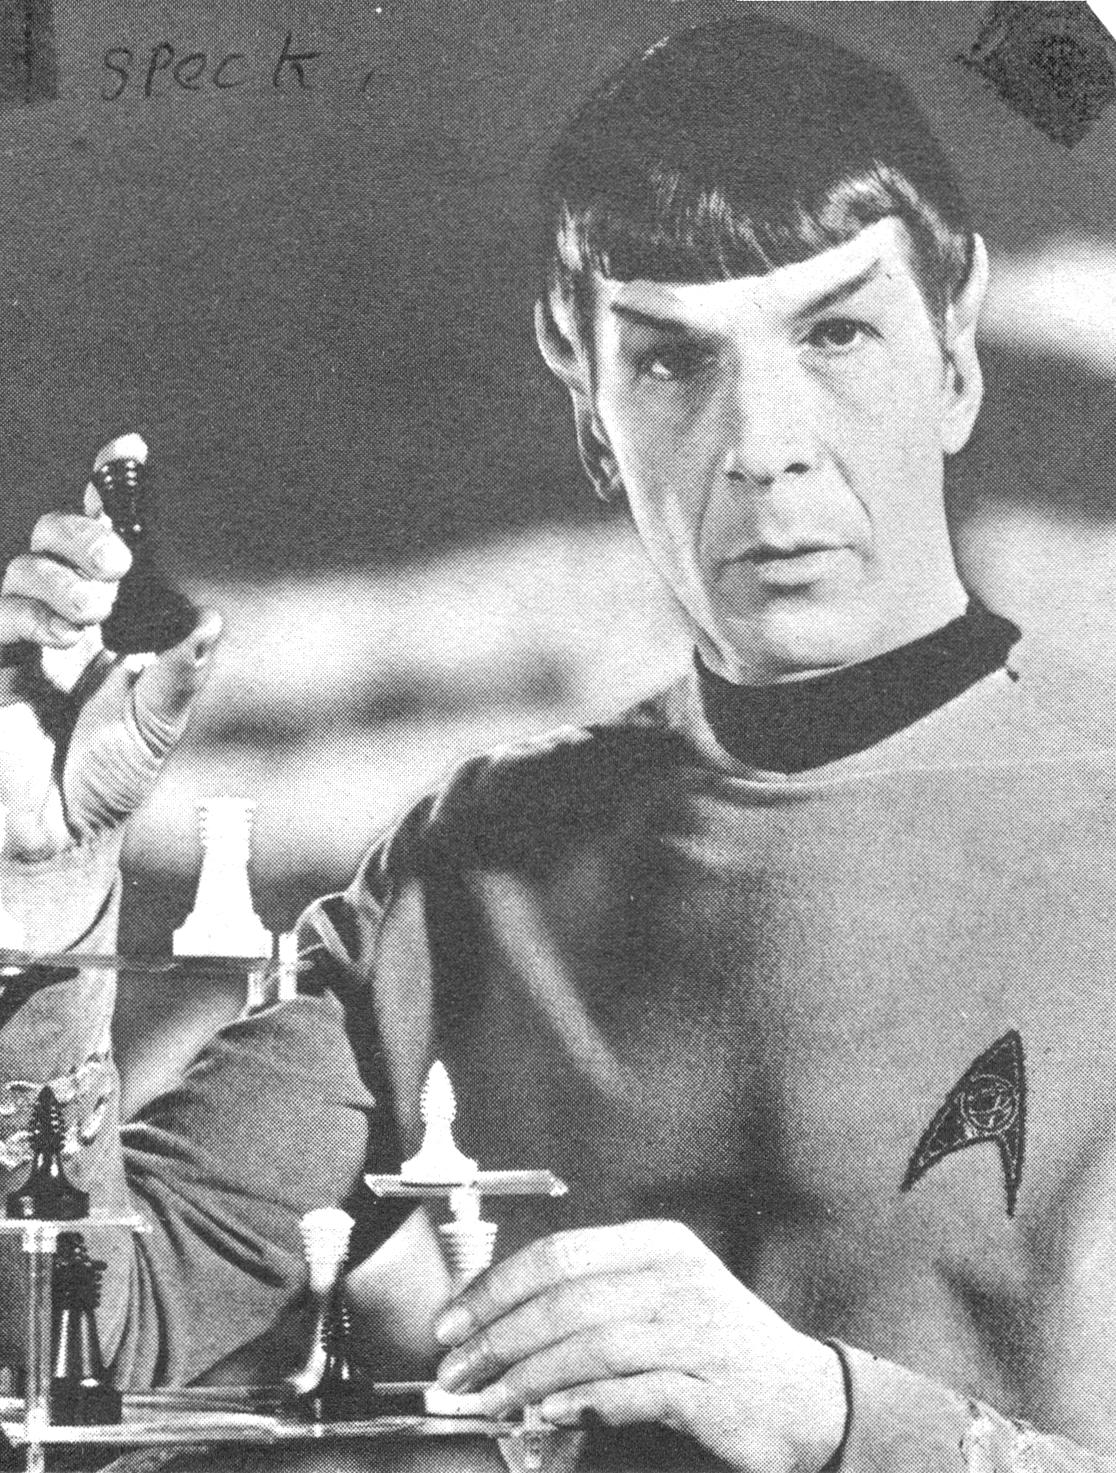 RG Cameron Dec 20 Illo #4 Spock very smart